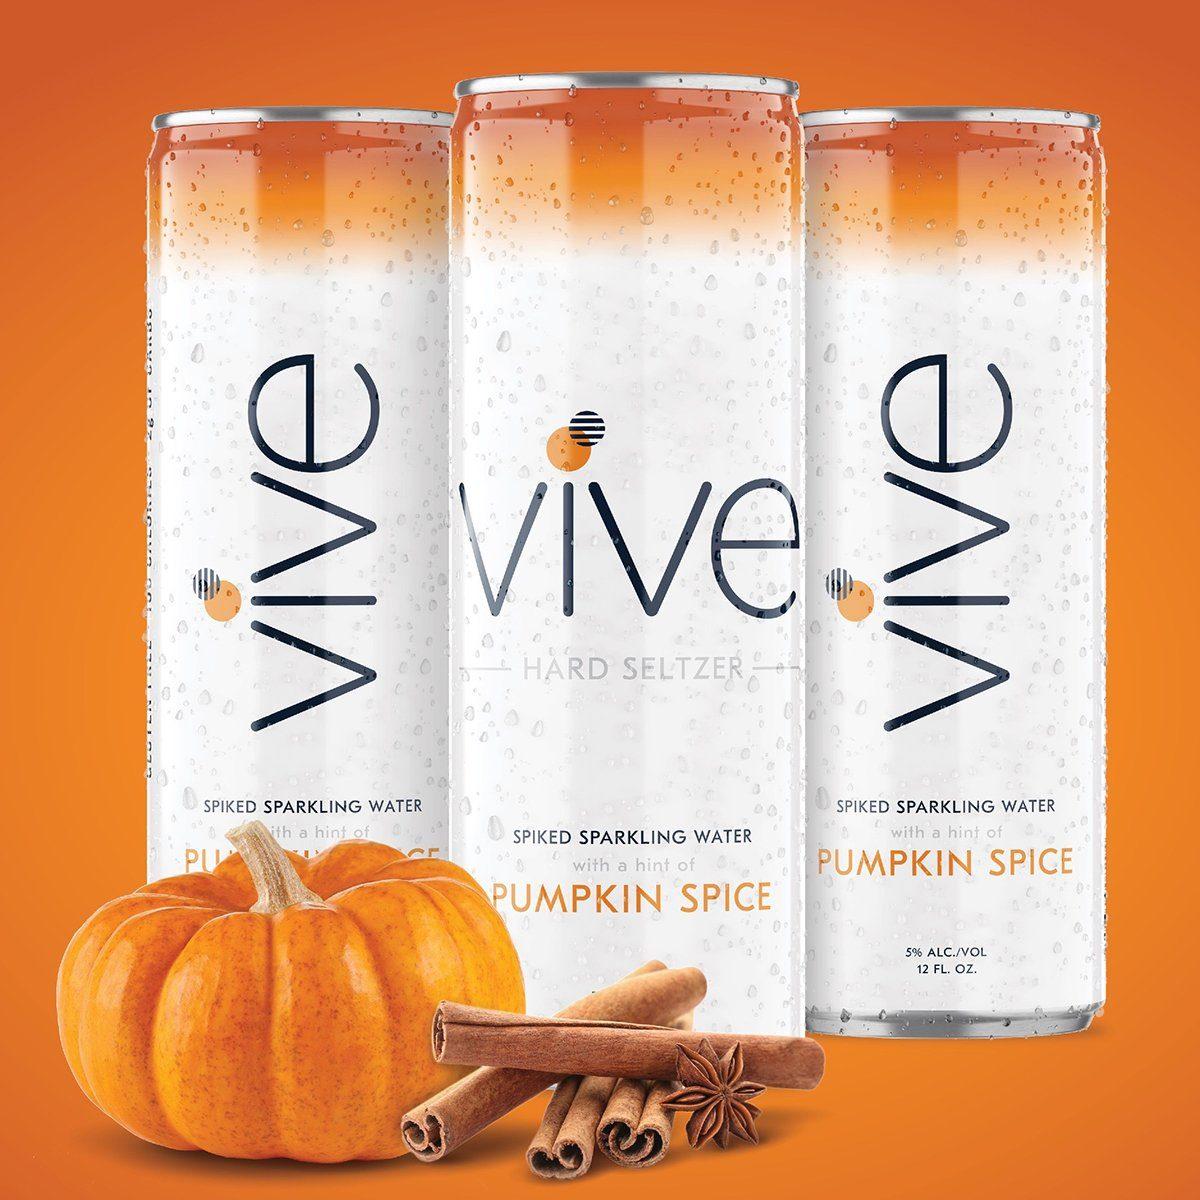 pumpkin spice vive hard seltzer